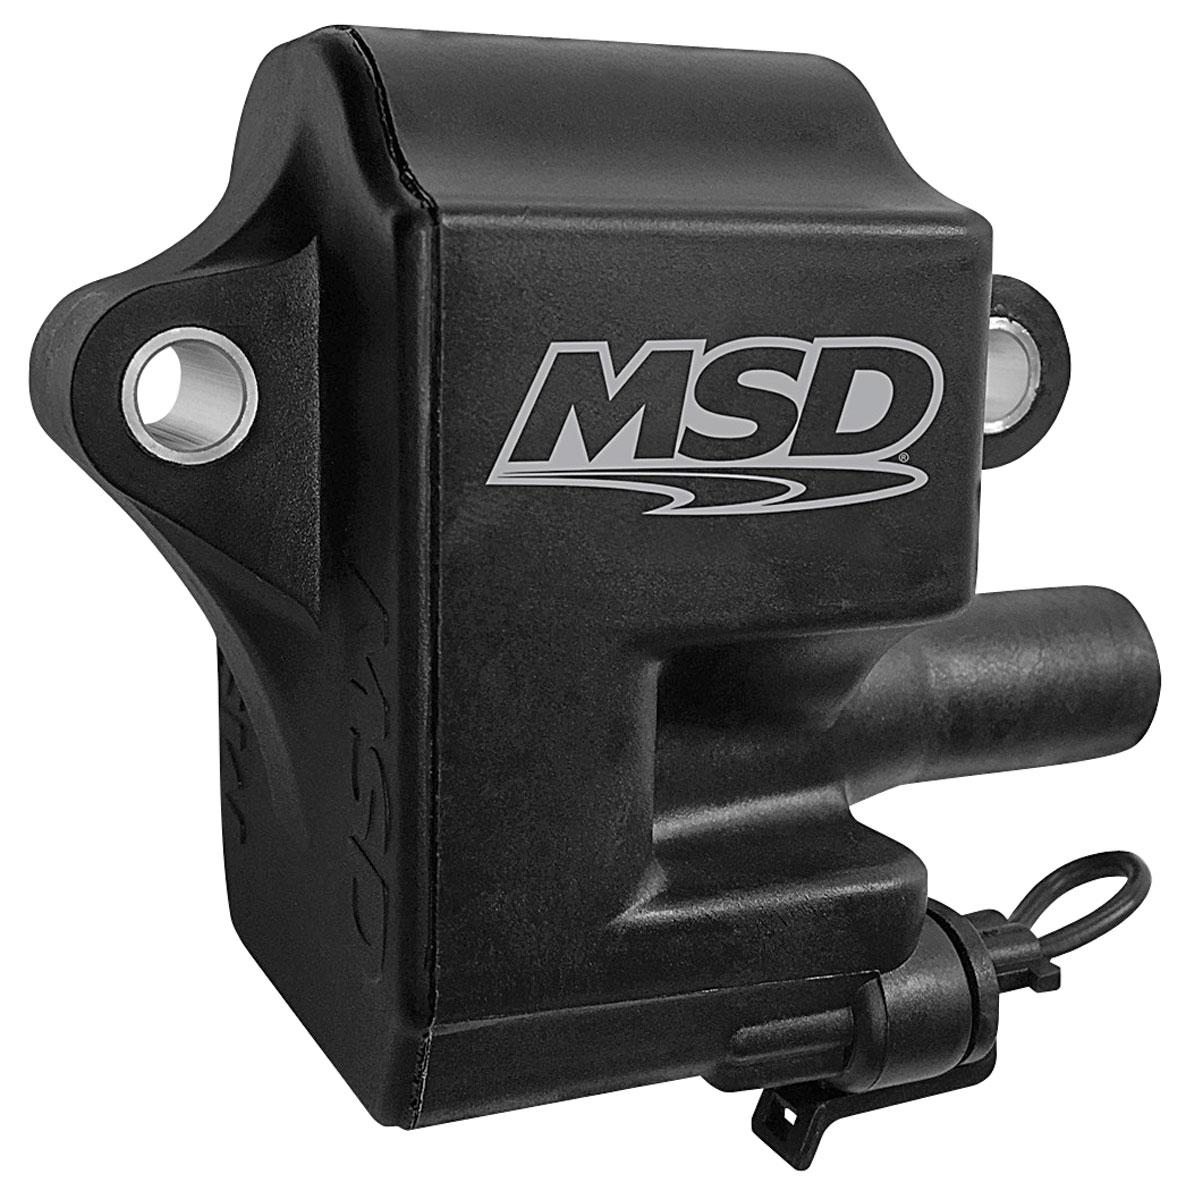 Coil, Pro Power, MSD, LS1/LS6